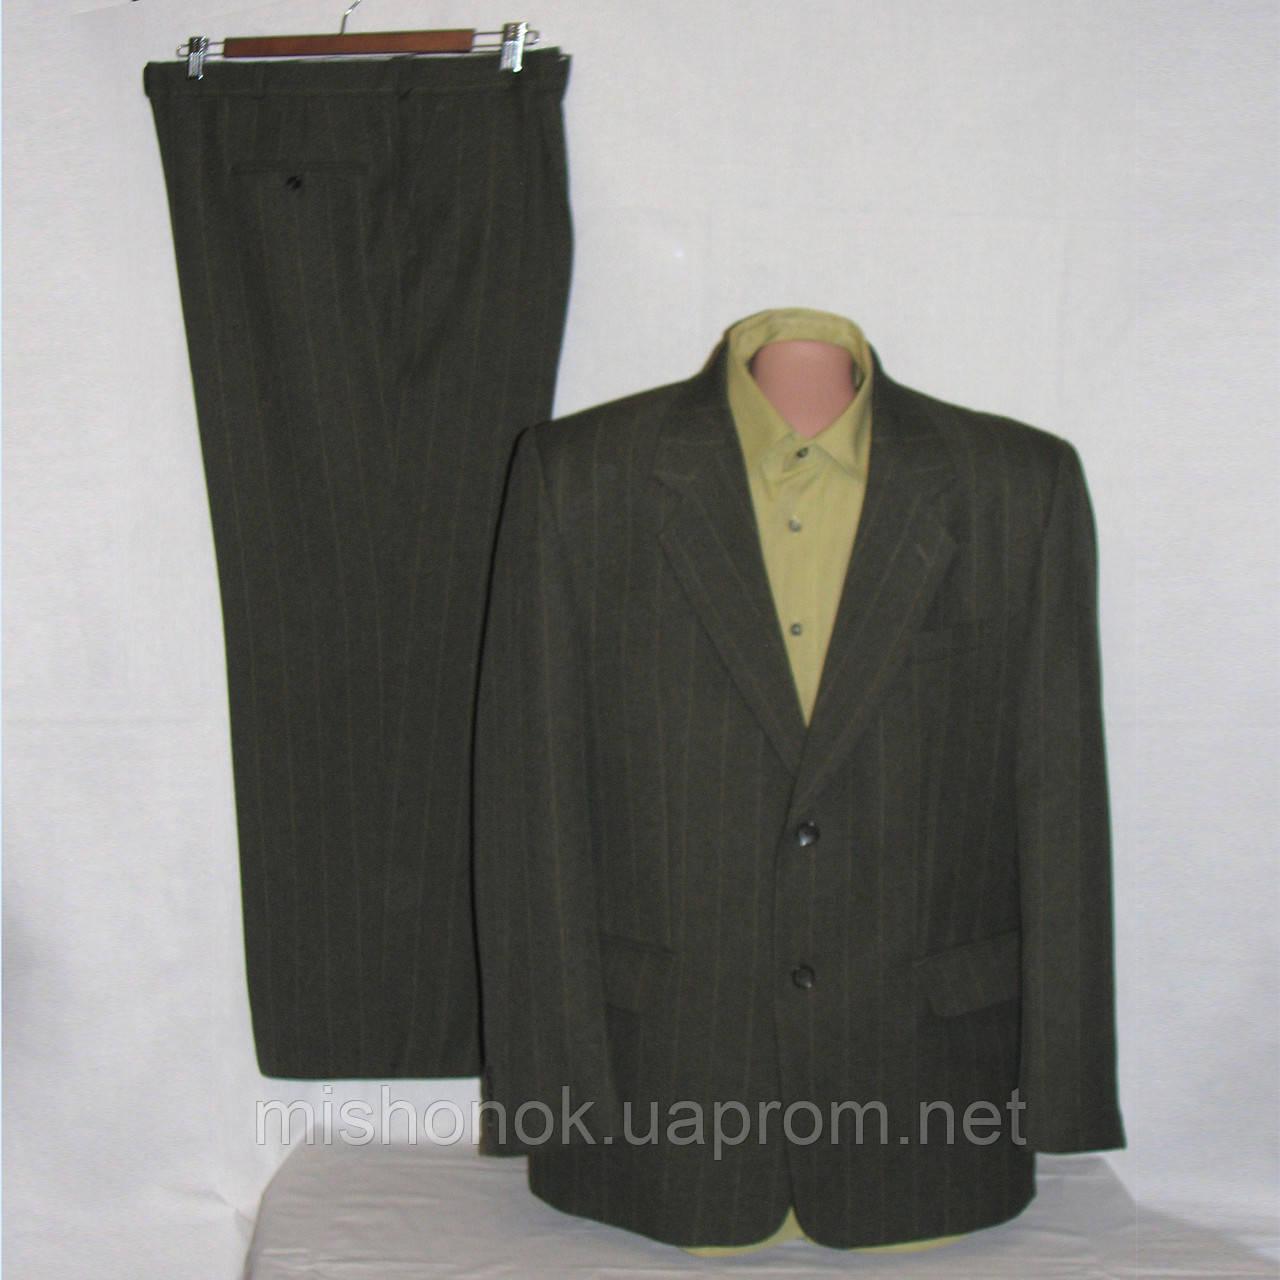 Мужской костюм West fashion evolution р. 48-50